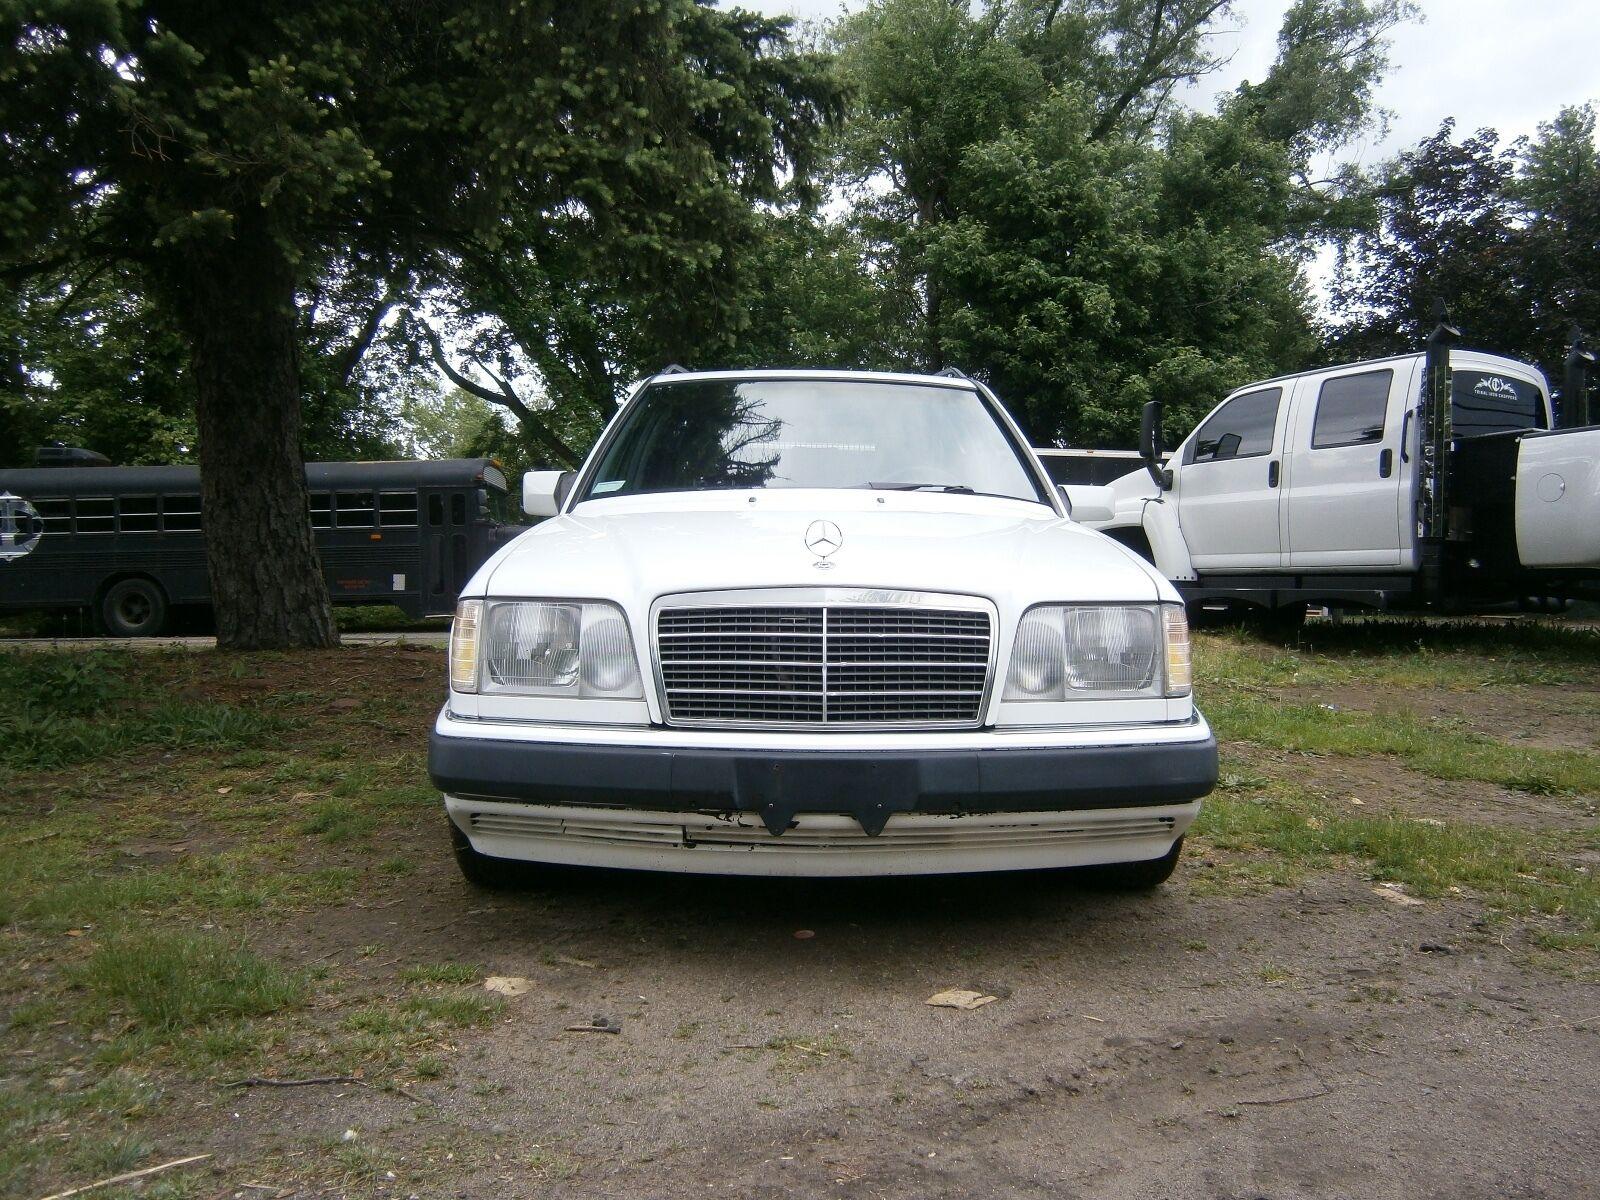 1995 mercedes benz e320 wagon for sale in fair lawn new for 1995 mercedes benz e320 for sale